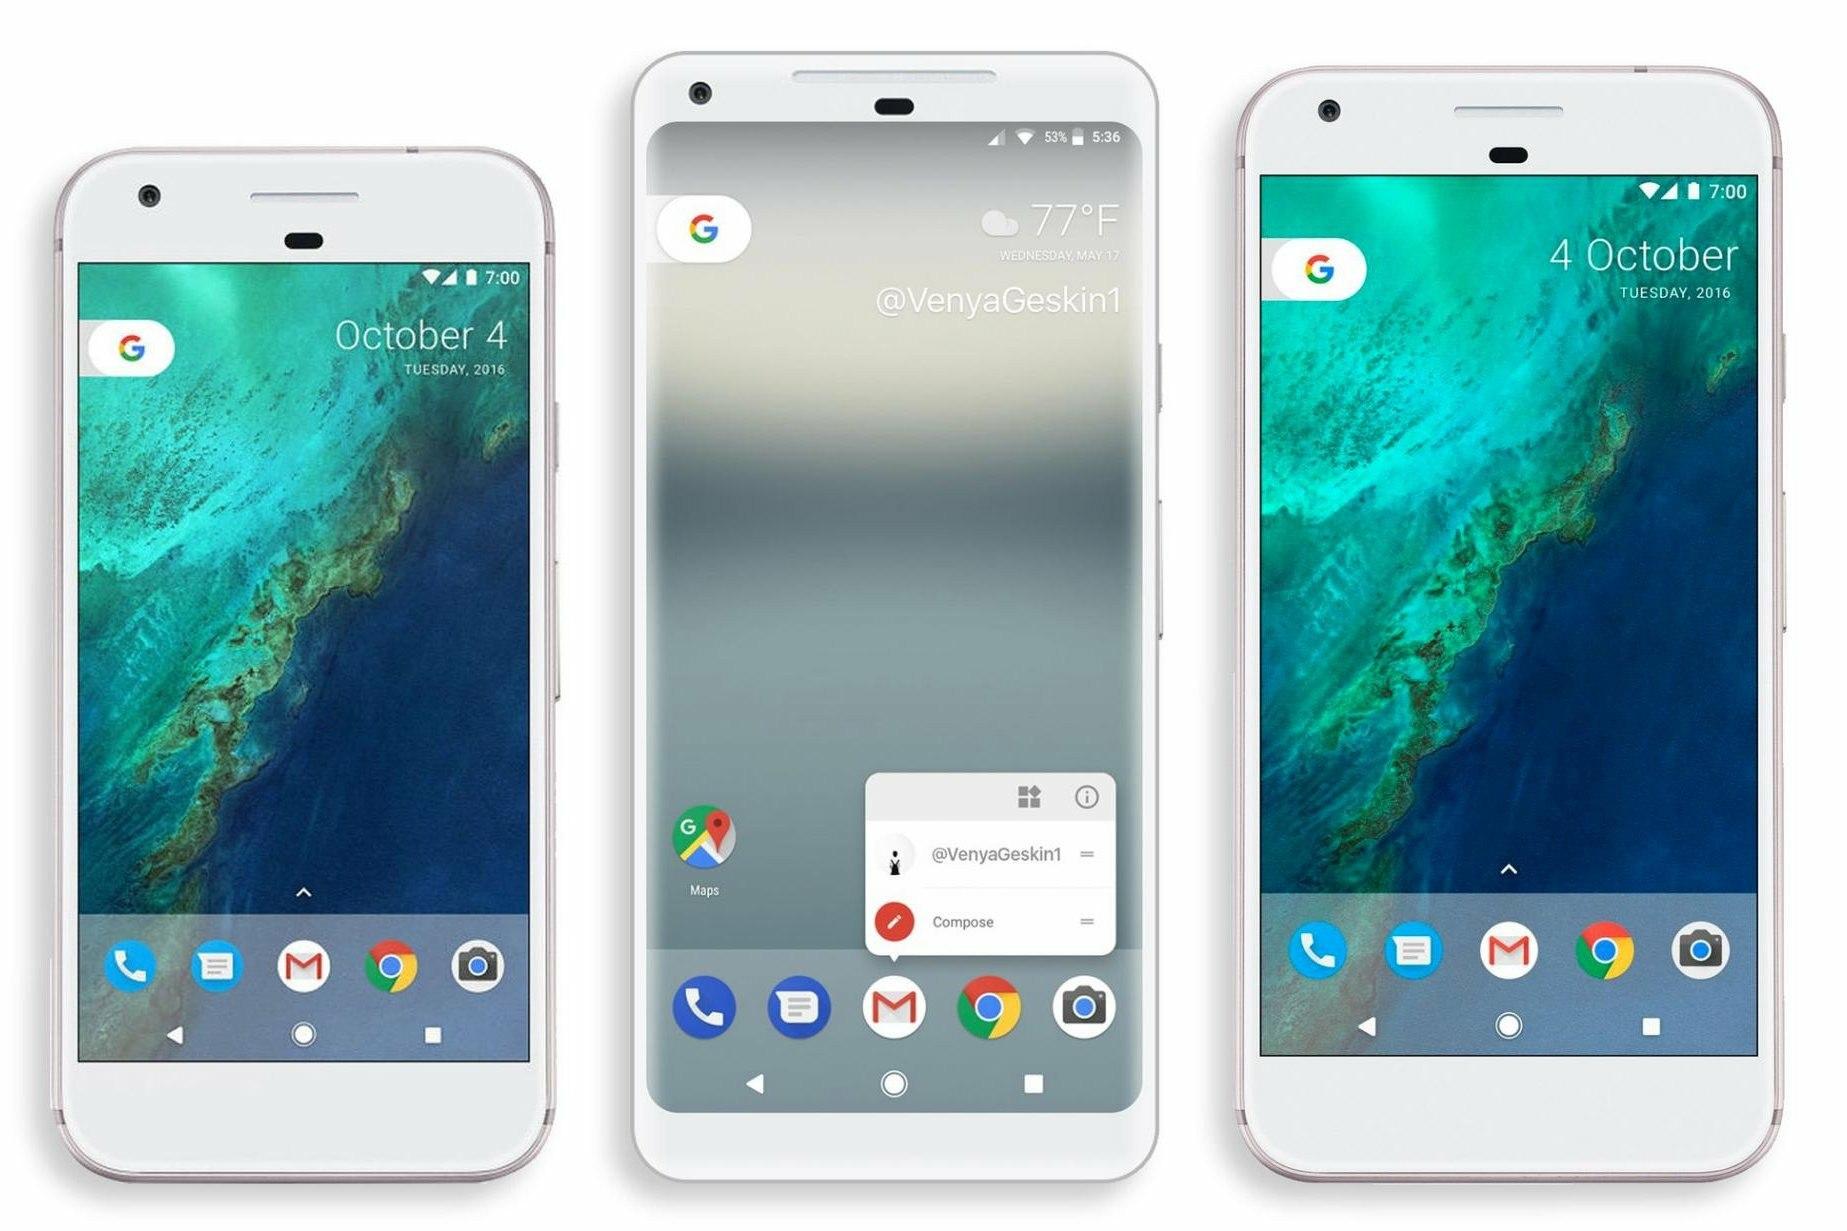 рендер Google Pixel 2 XL в сравнению с текущими Pixel